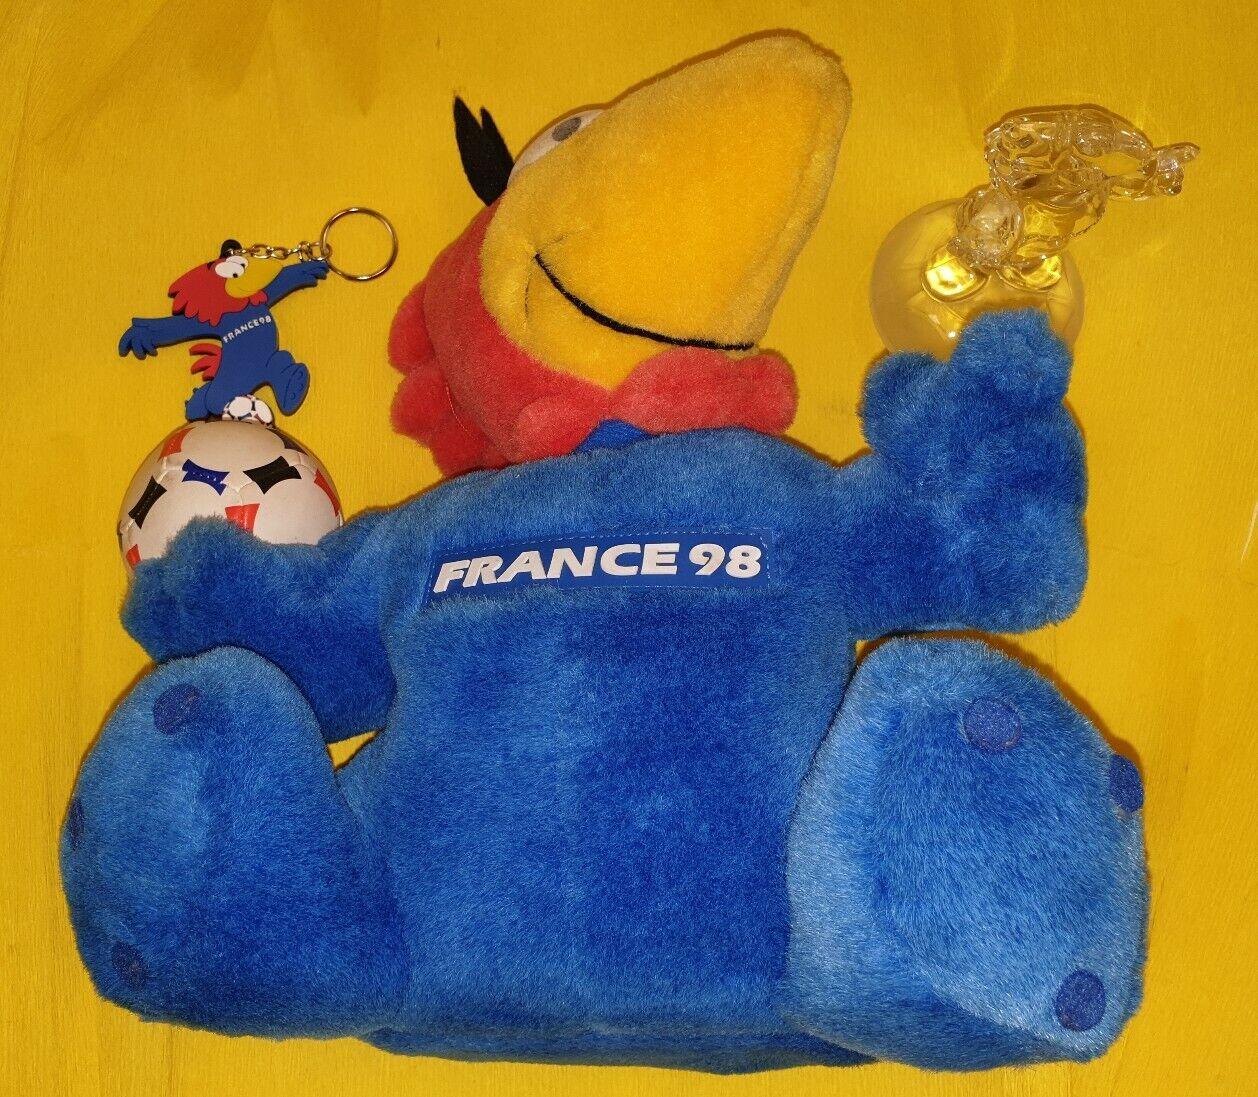 World Cup France 1998 FOOTIX'98 Glass Plush & Rubber Soccer Mascot Figure Set